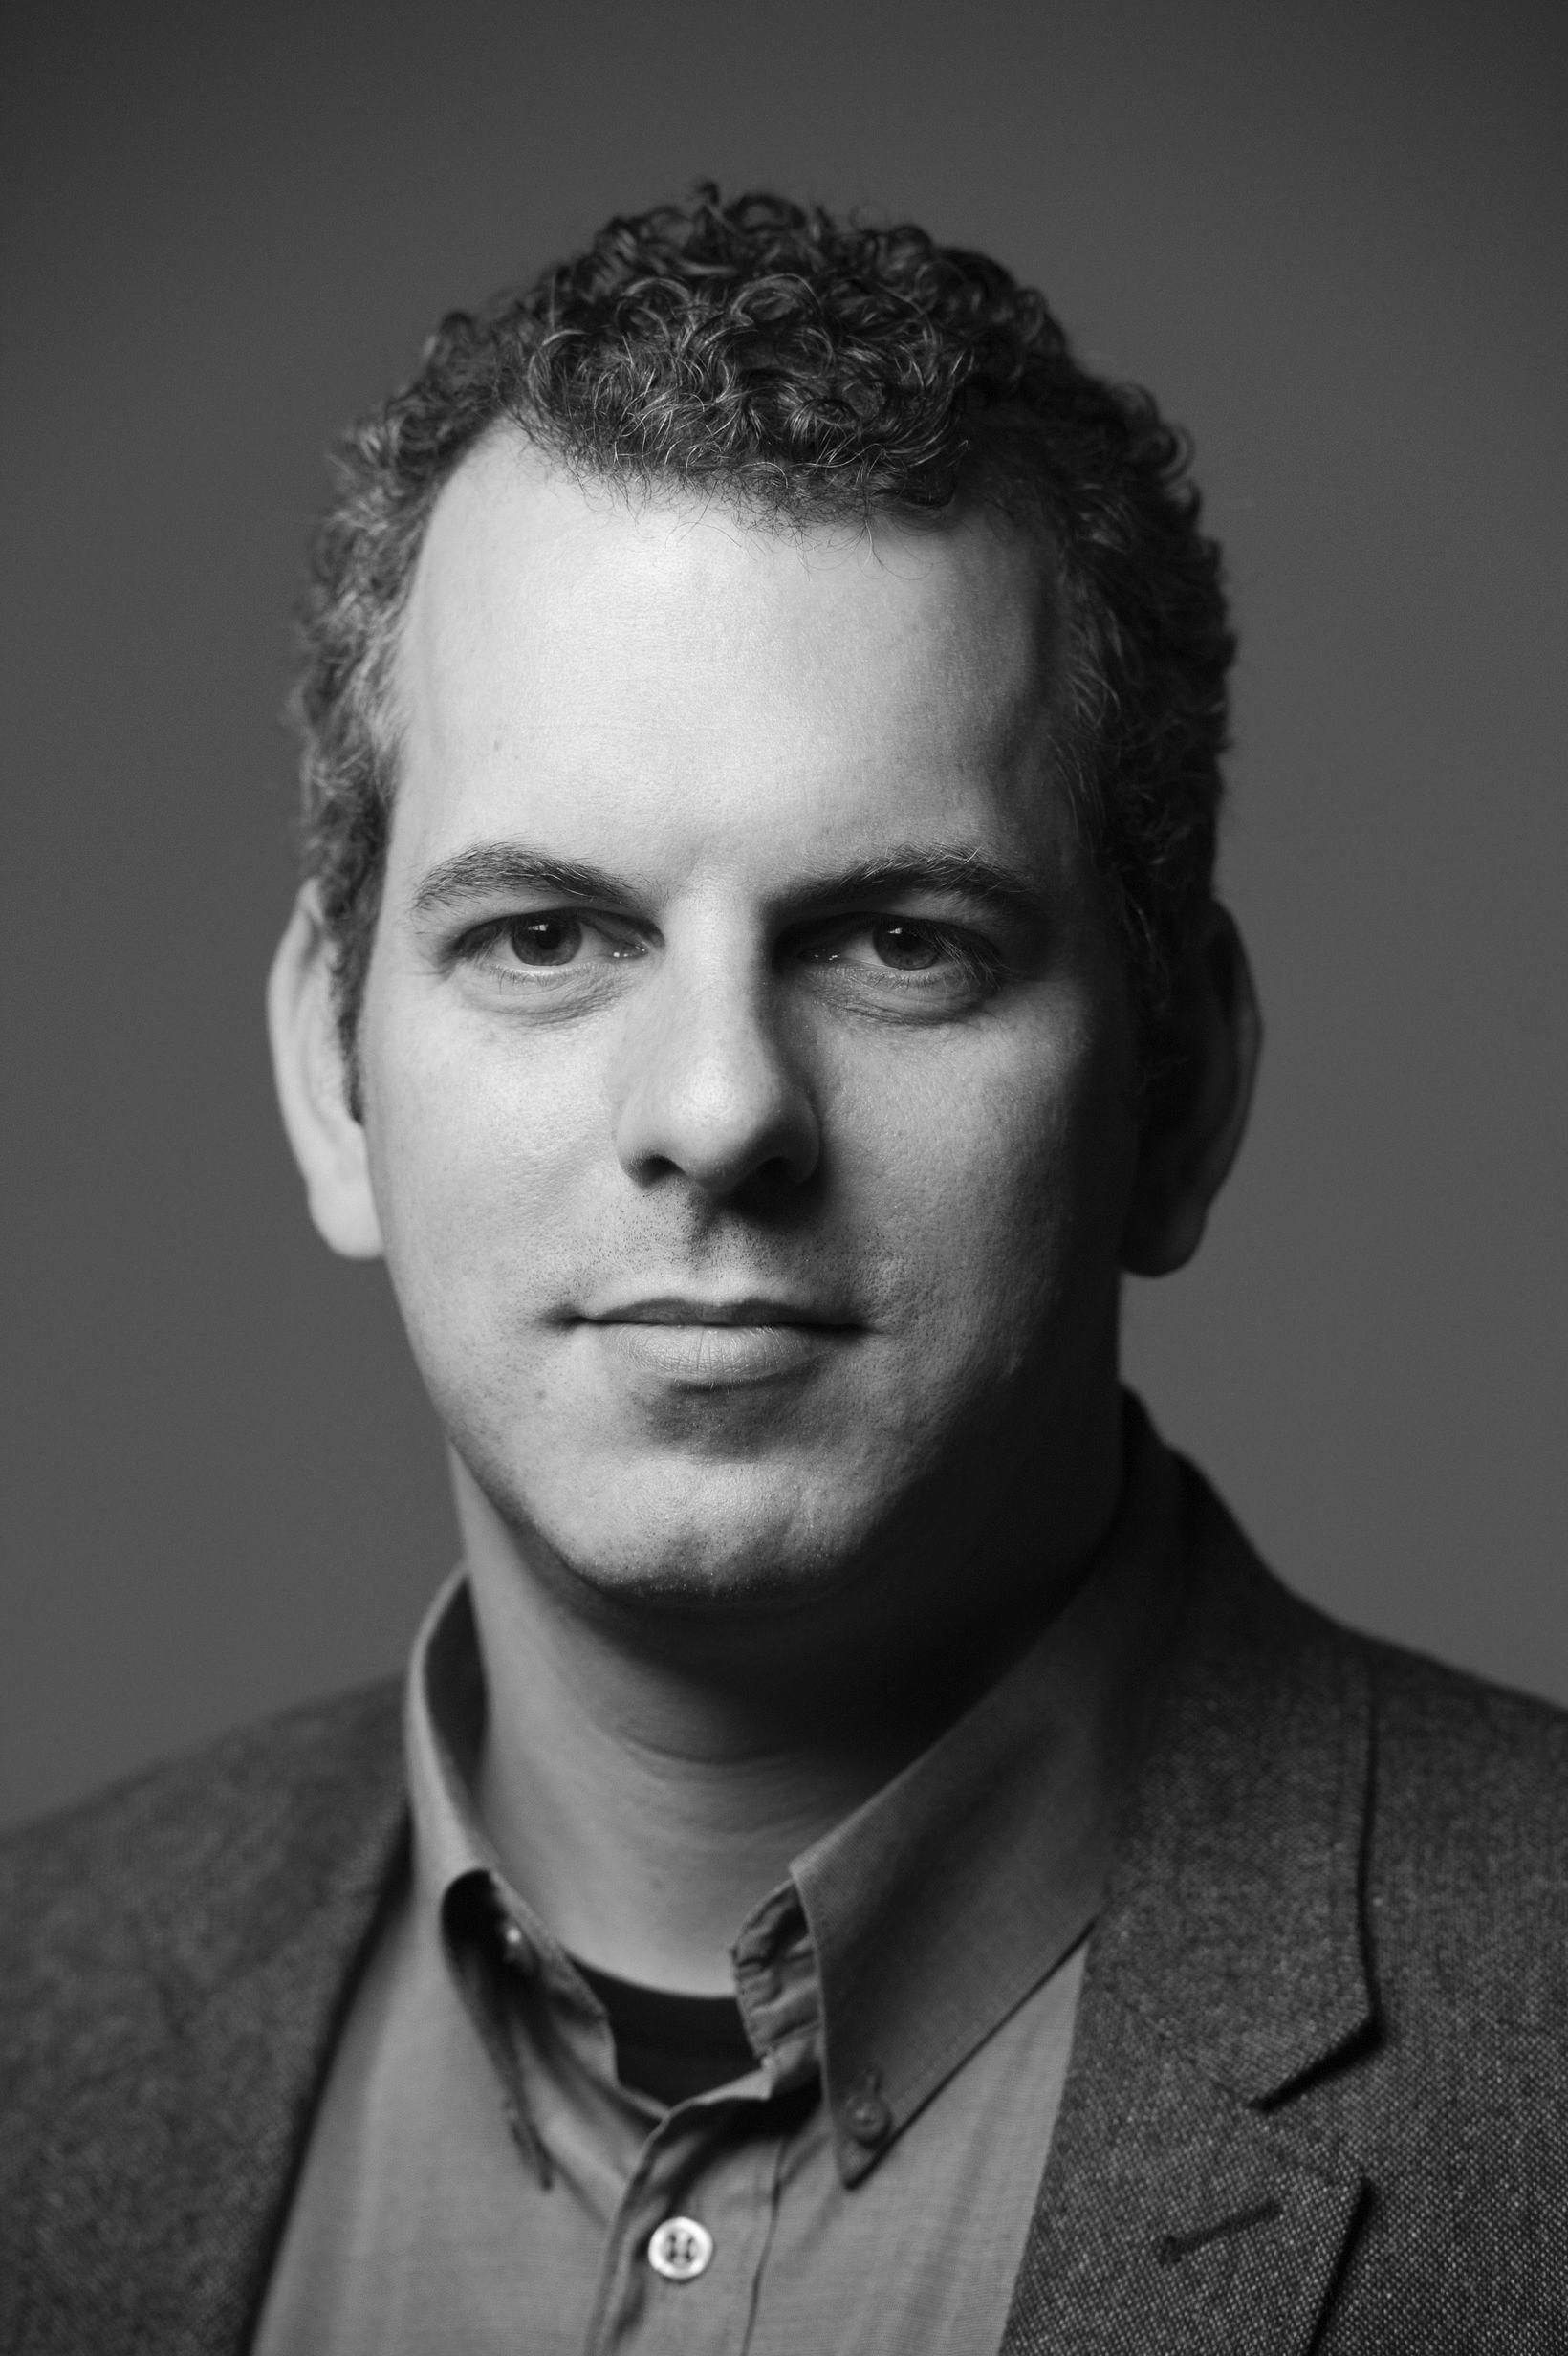 Marc-Andre Gagnon Headshot